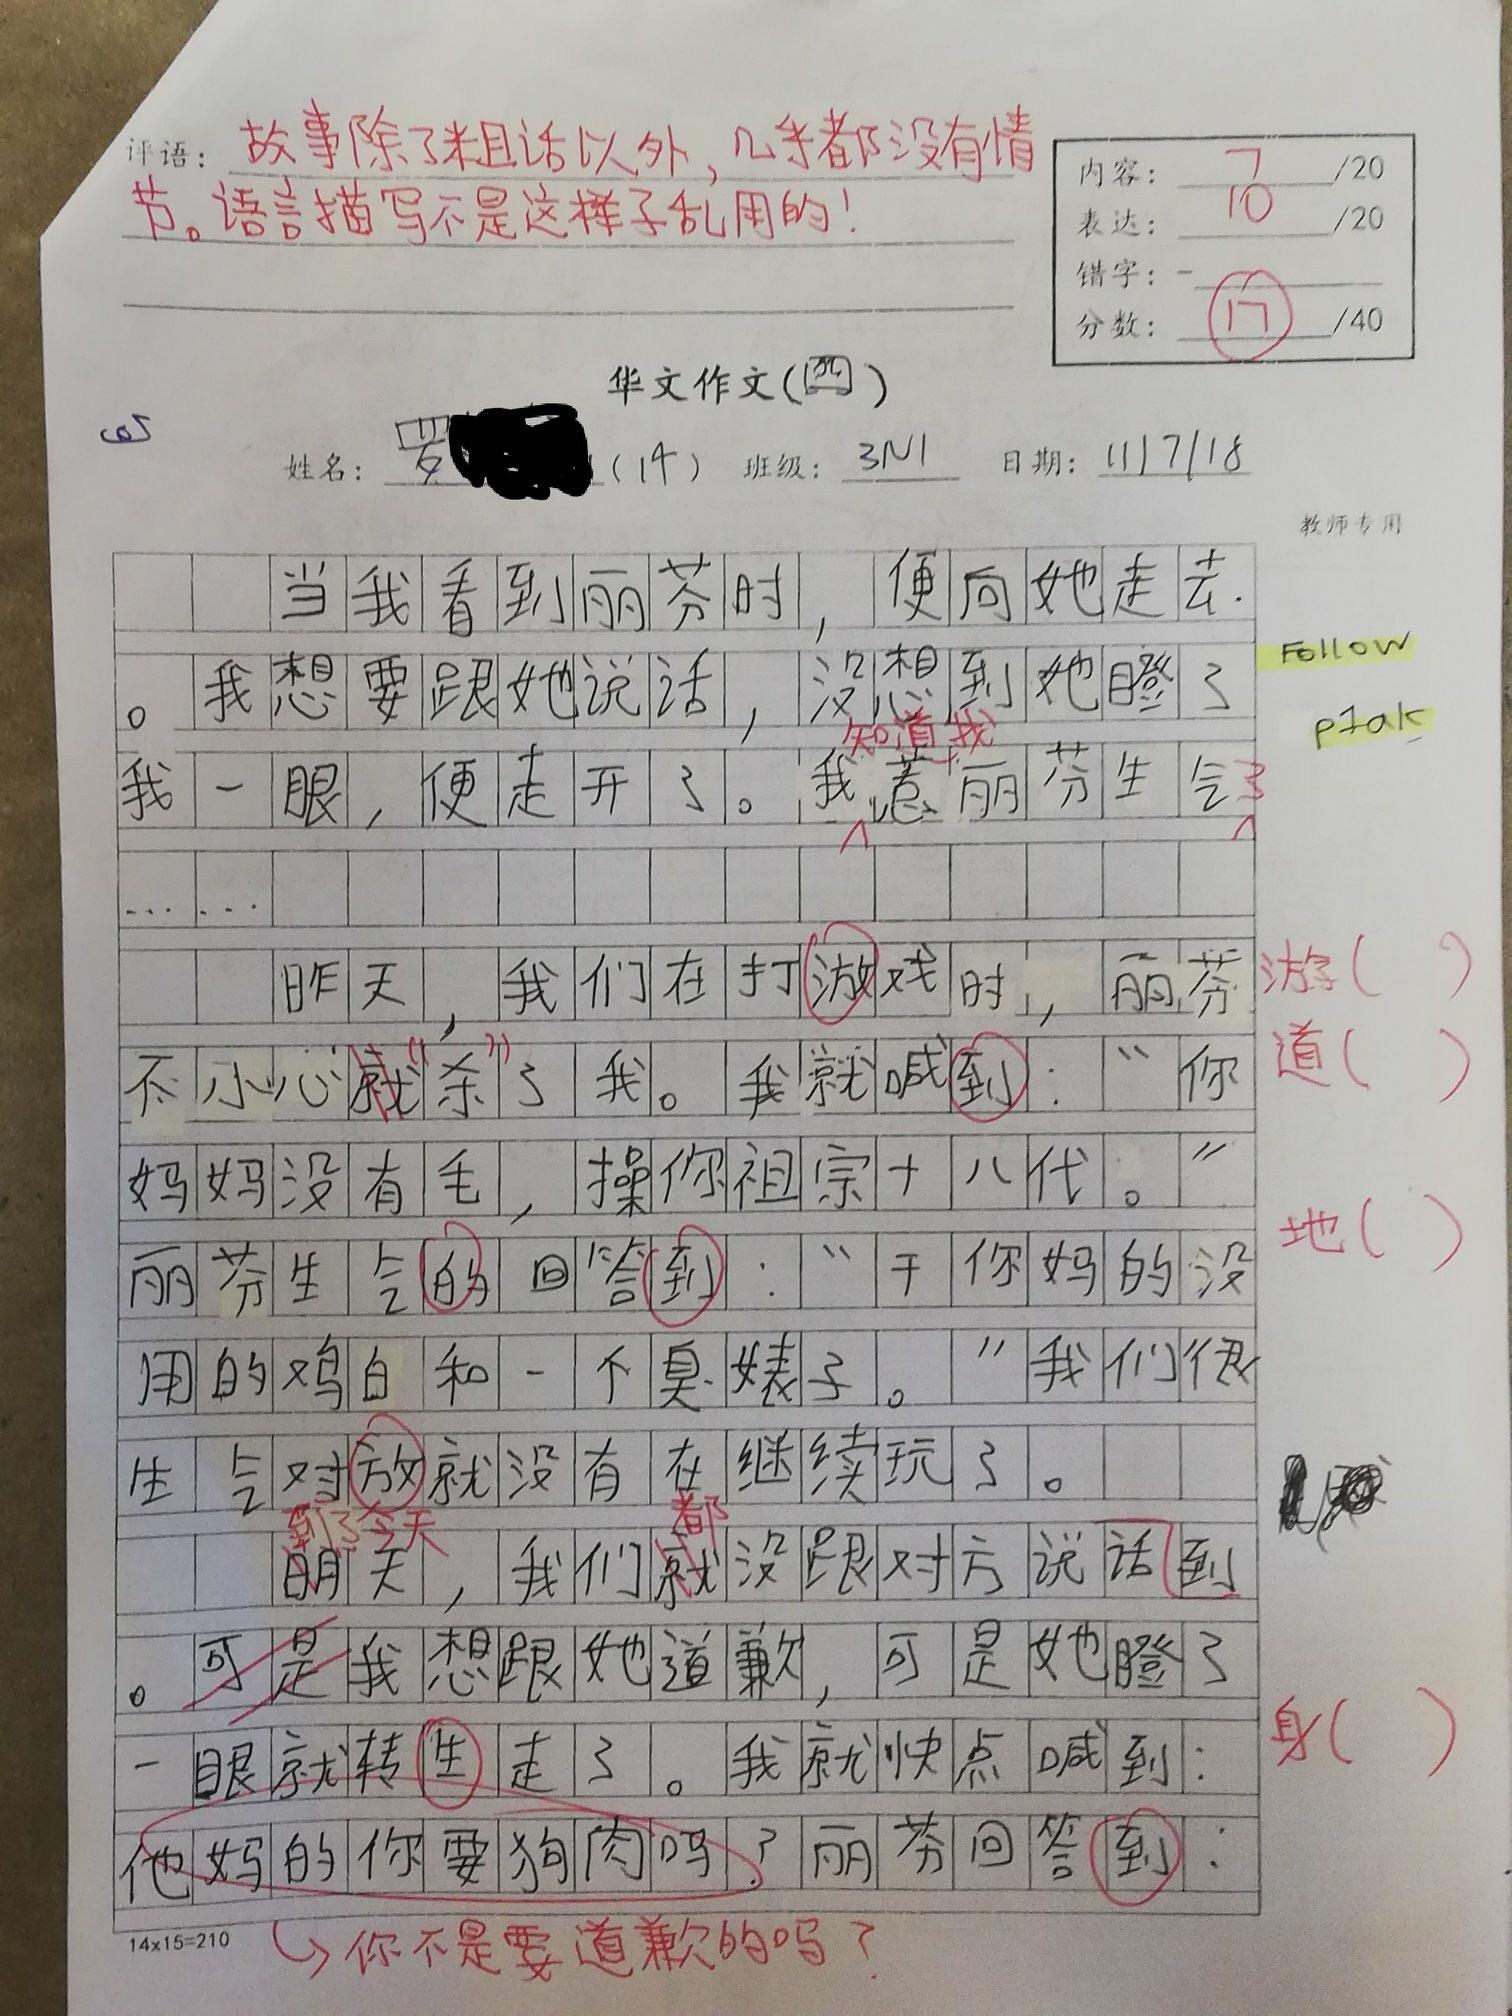 017 Essay Example Wbn5f0l88kj11 Amazing Chinese Art Topics Vce Formats Sheet Full